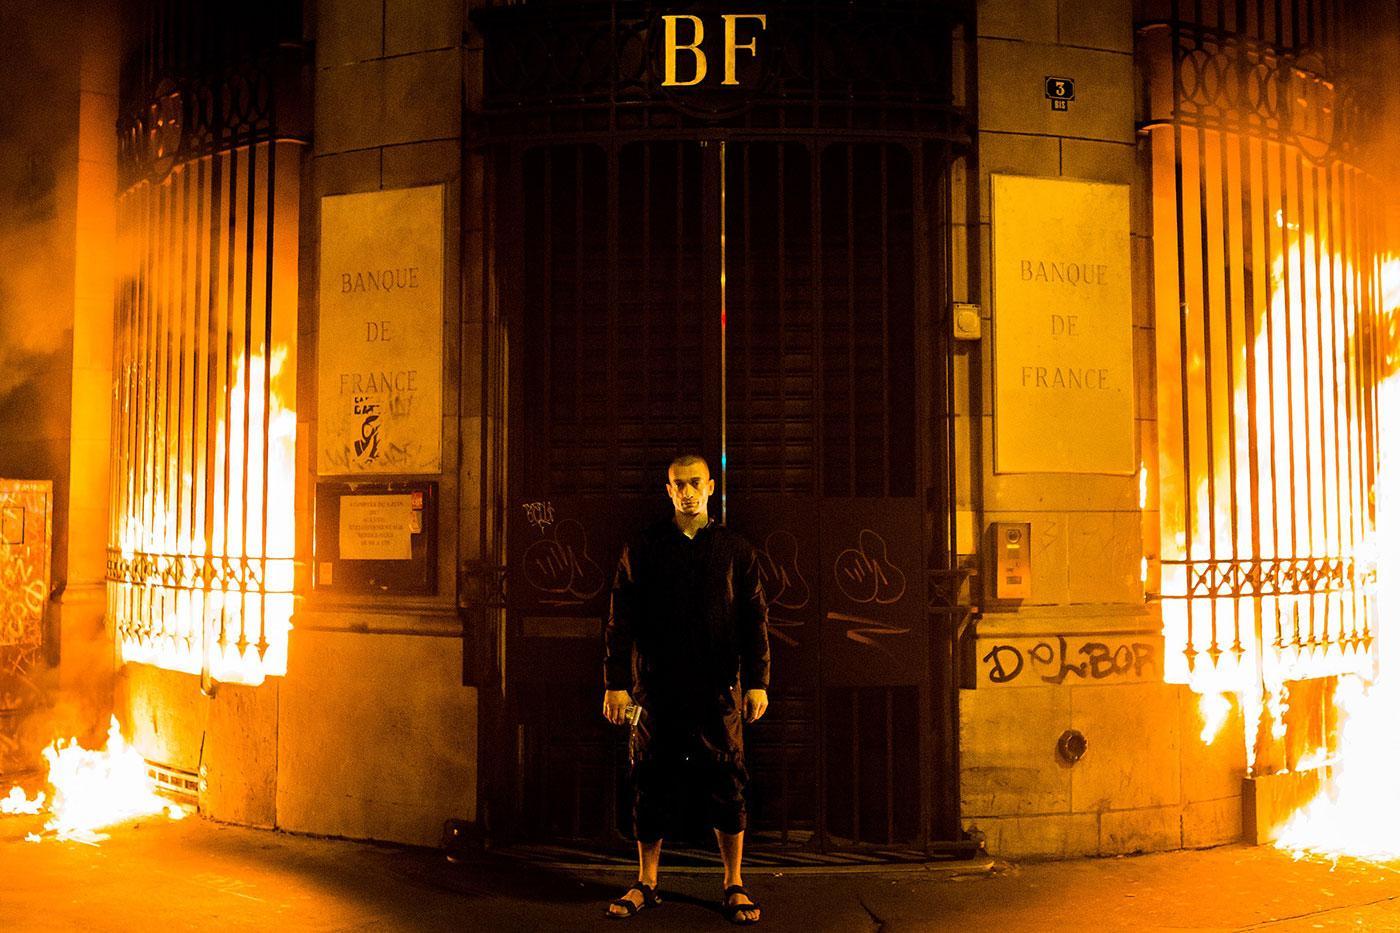 Это не дверь ФСБ, а вход в Банк Франции. Фото © Wikipedia